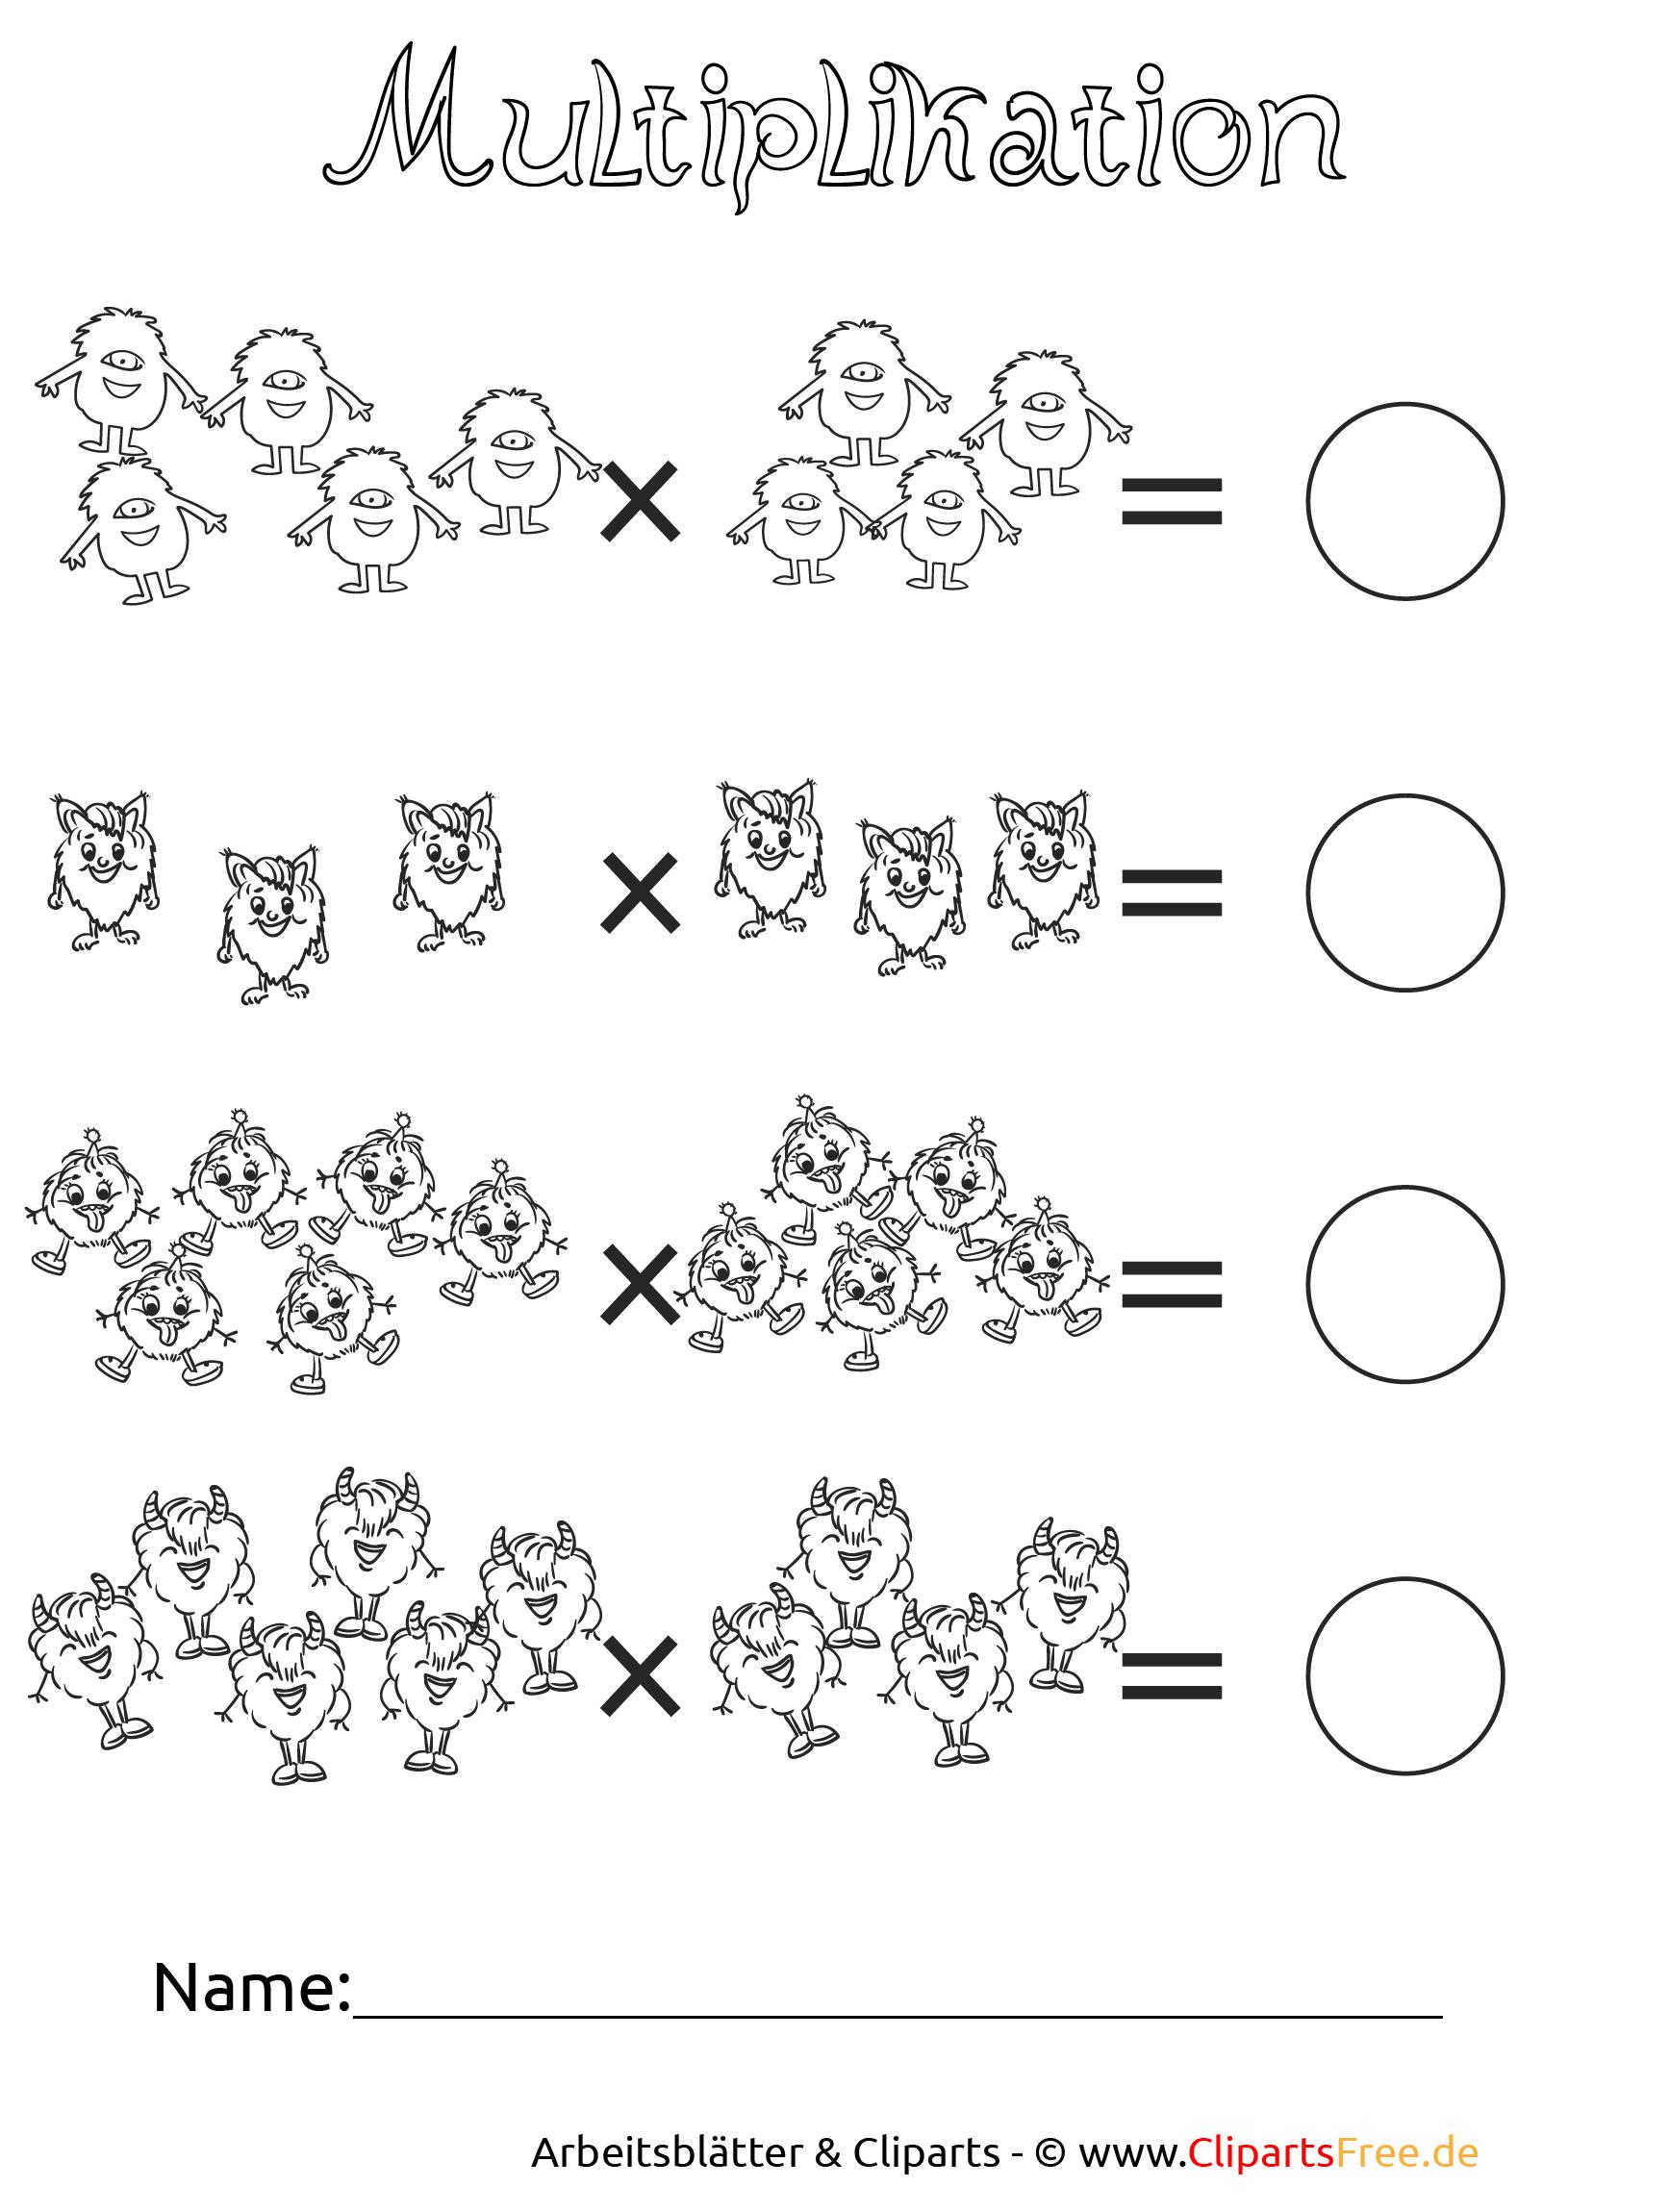 Arbeitsblätter Mathematik Multiplikation : Übungsblätter grundschule schriftliche multiplikation